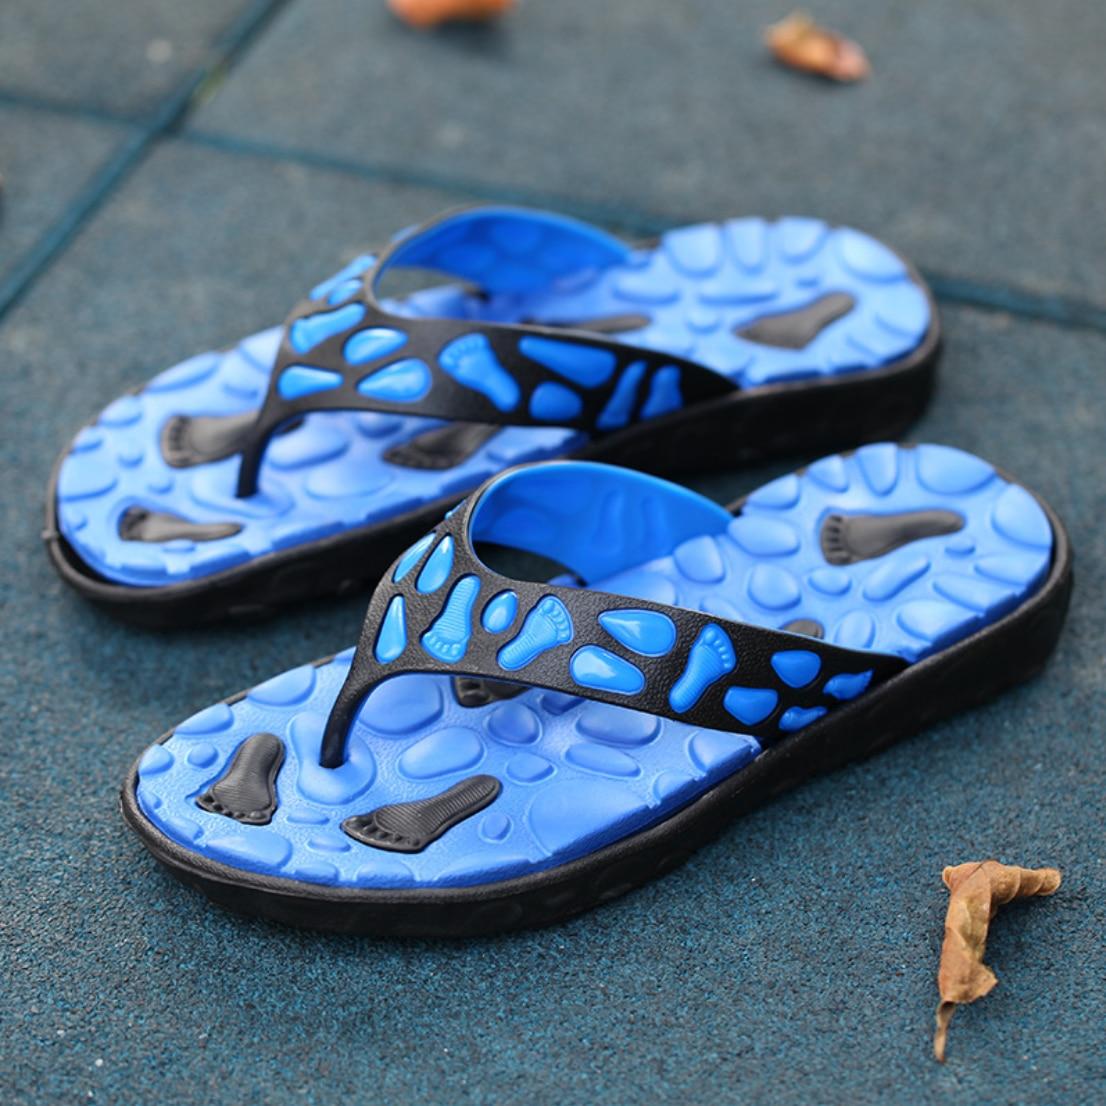 2020 Summer Men's Shoes EVA Sandals Flip Flops Comfortable Non-slip Beach Angle Slippers Flat Slippers Massage Shoes N